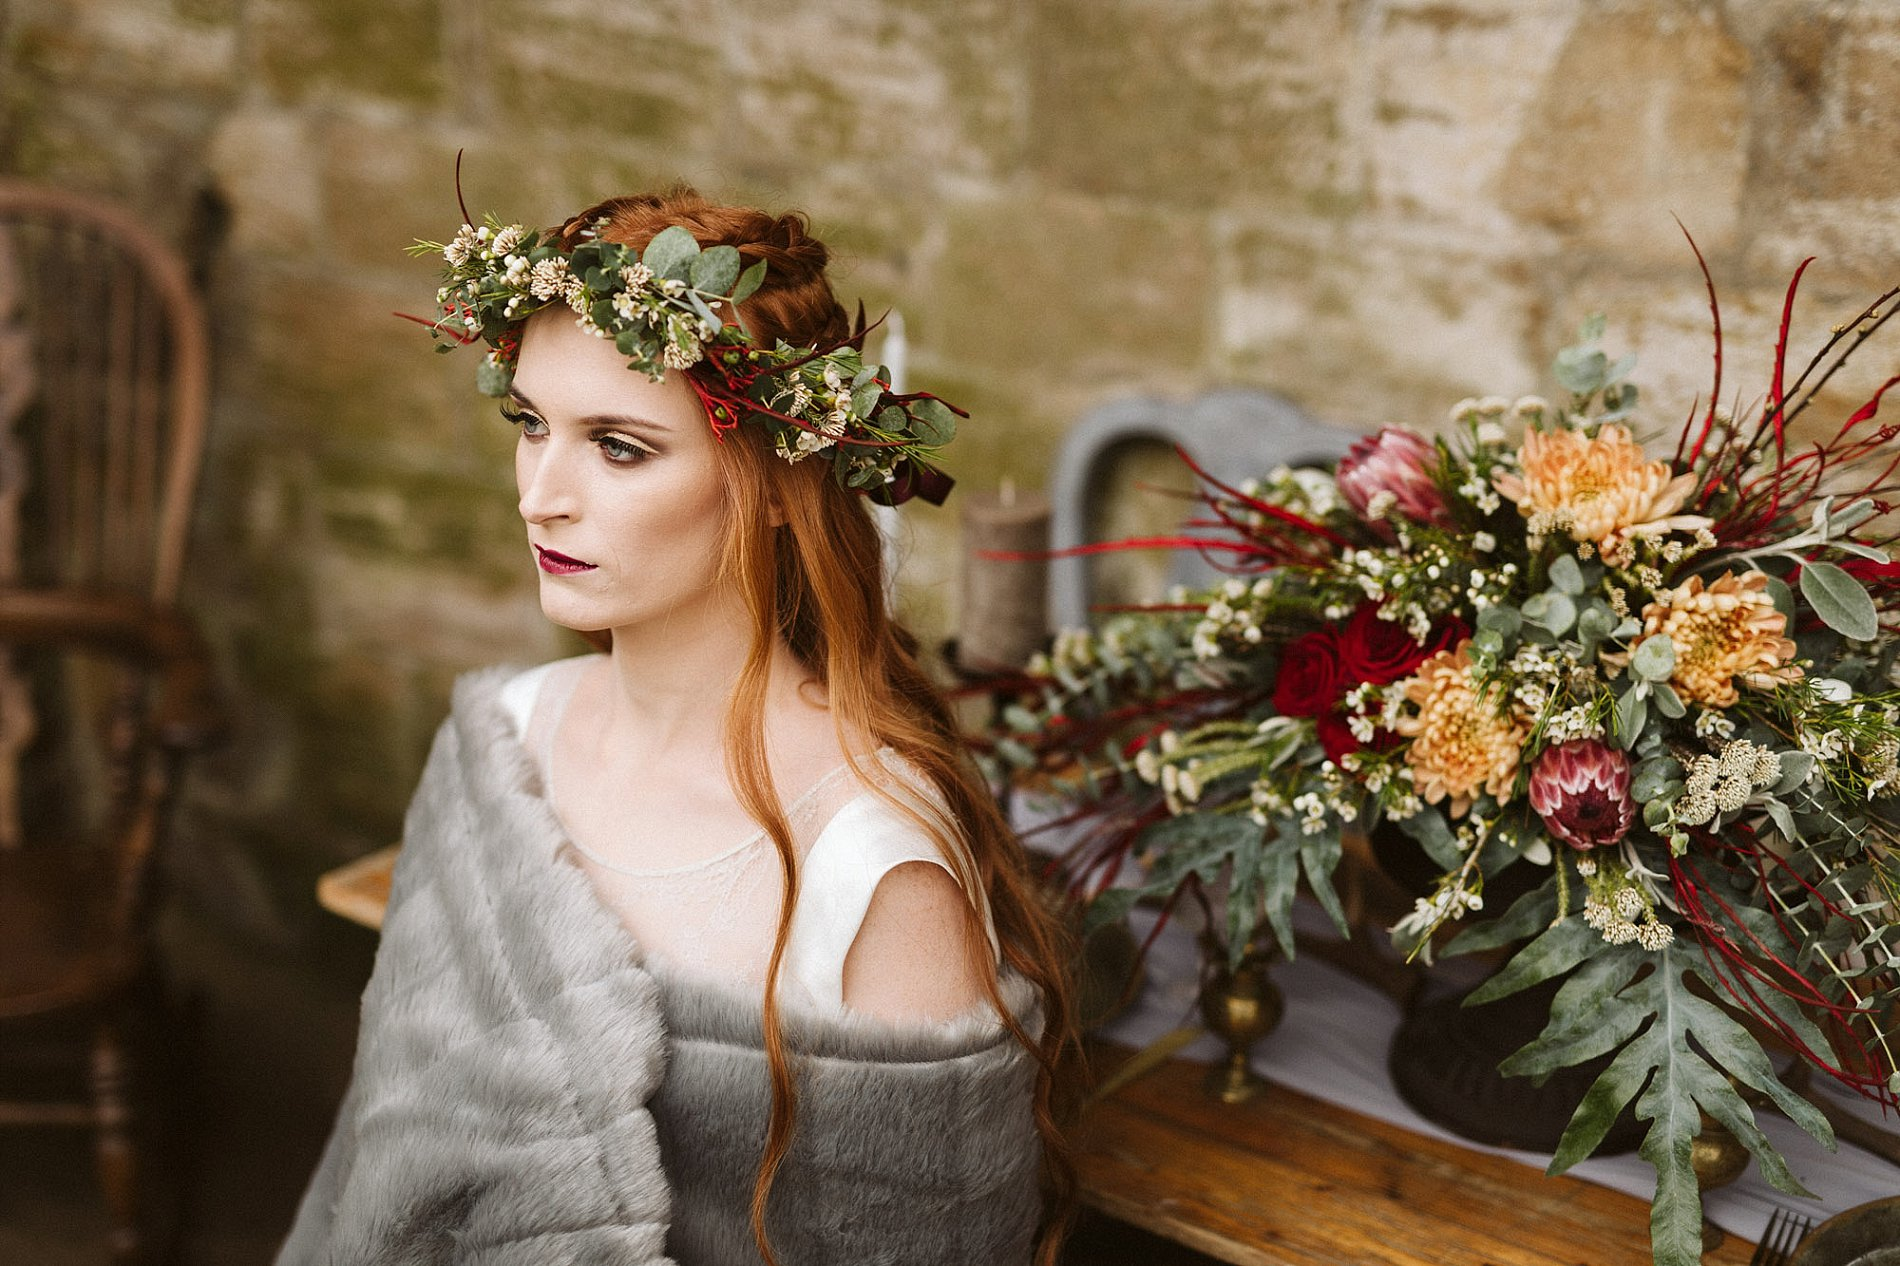 Game of Thrones Creative Bridal Shoot (c) Freya Raby (18)